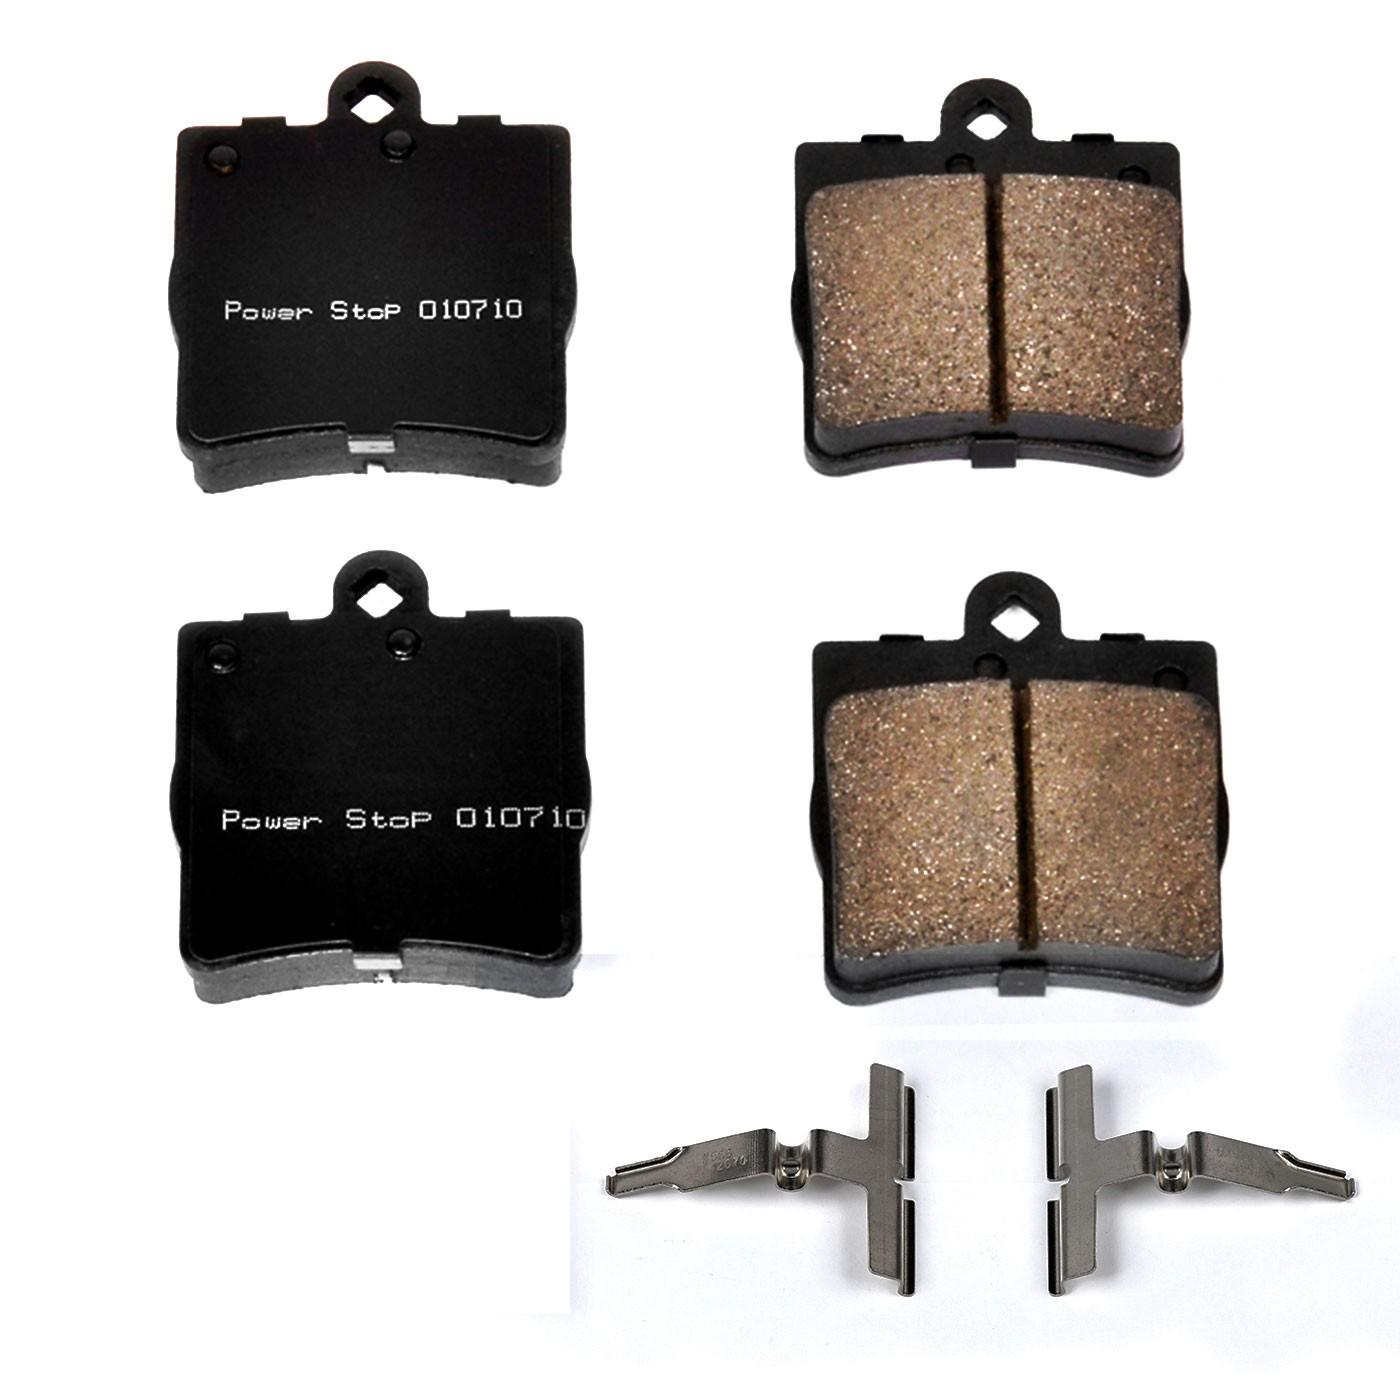 2005 Chrysler Crossfire Disc Brake Pad And Hardware Kit Wiring Harness P8 17 779